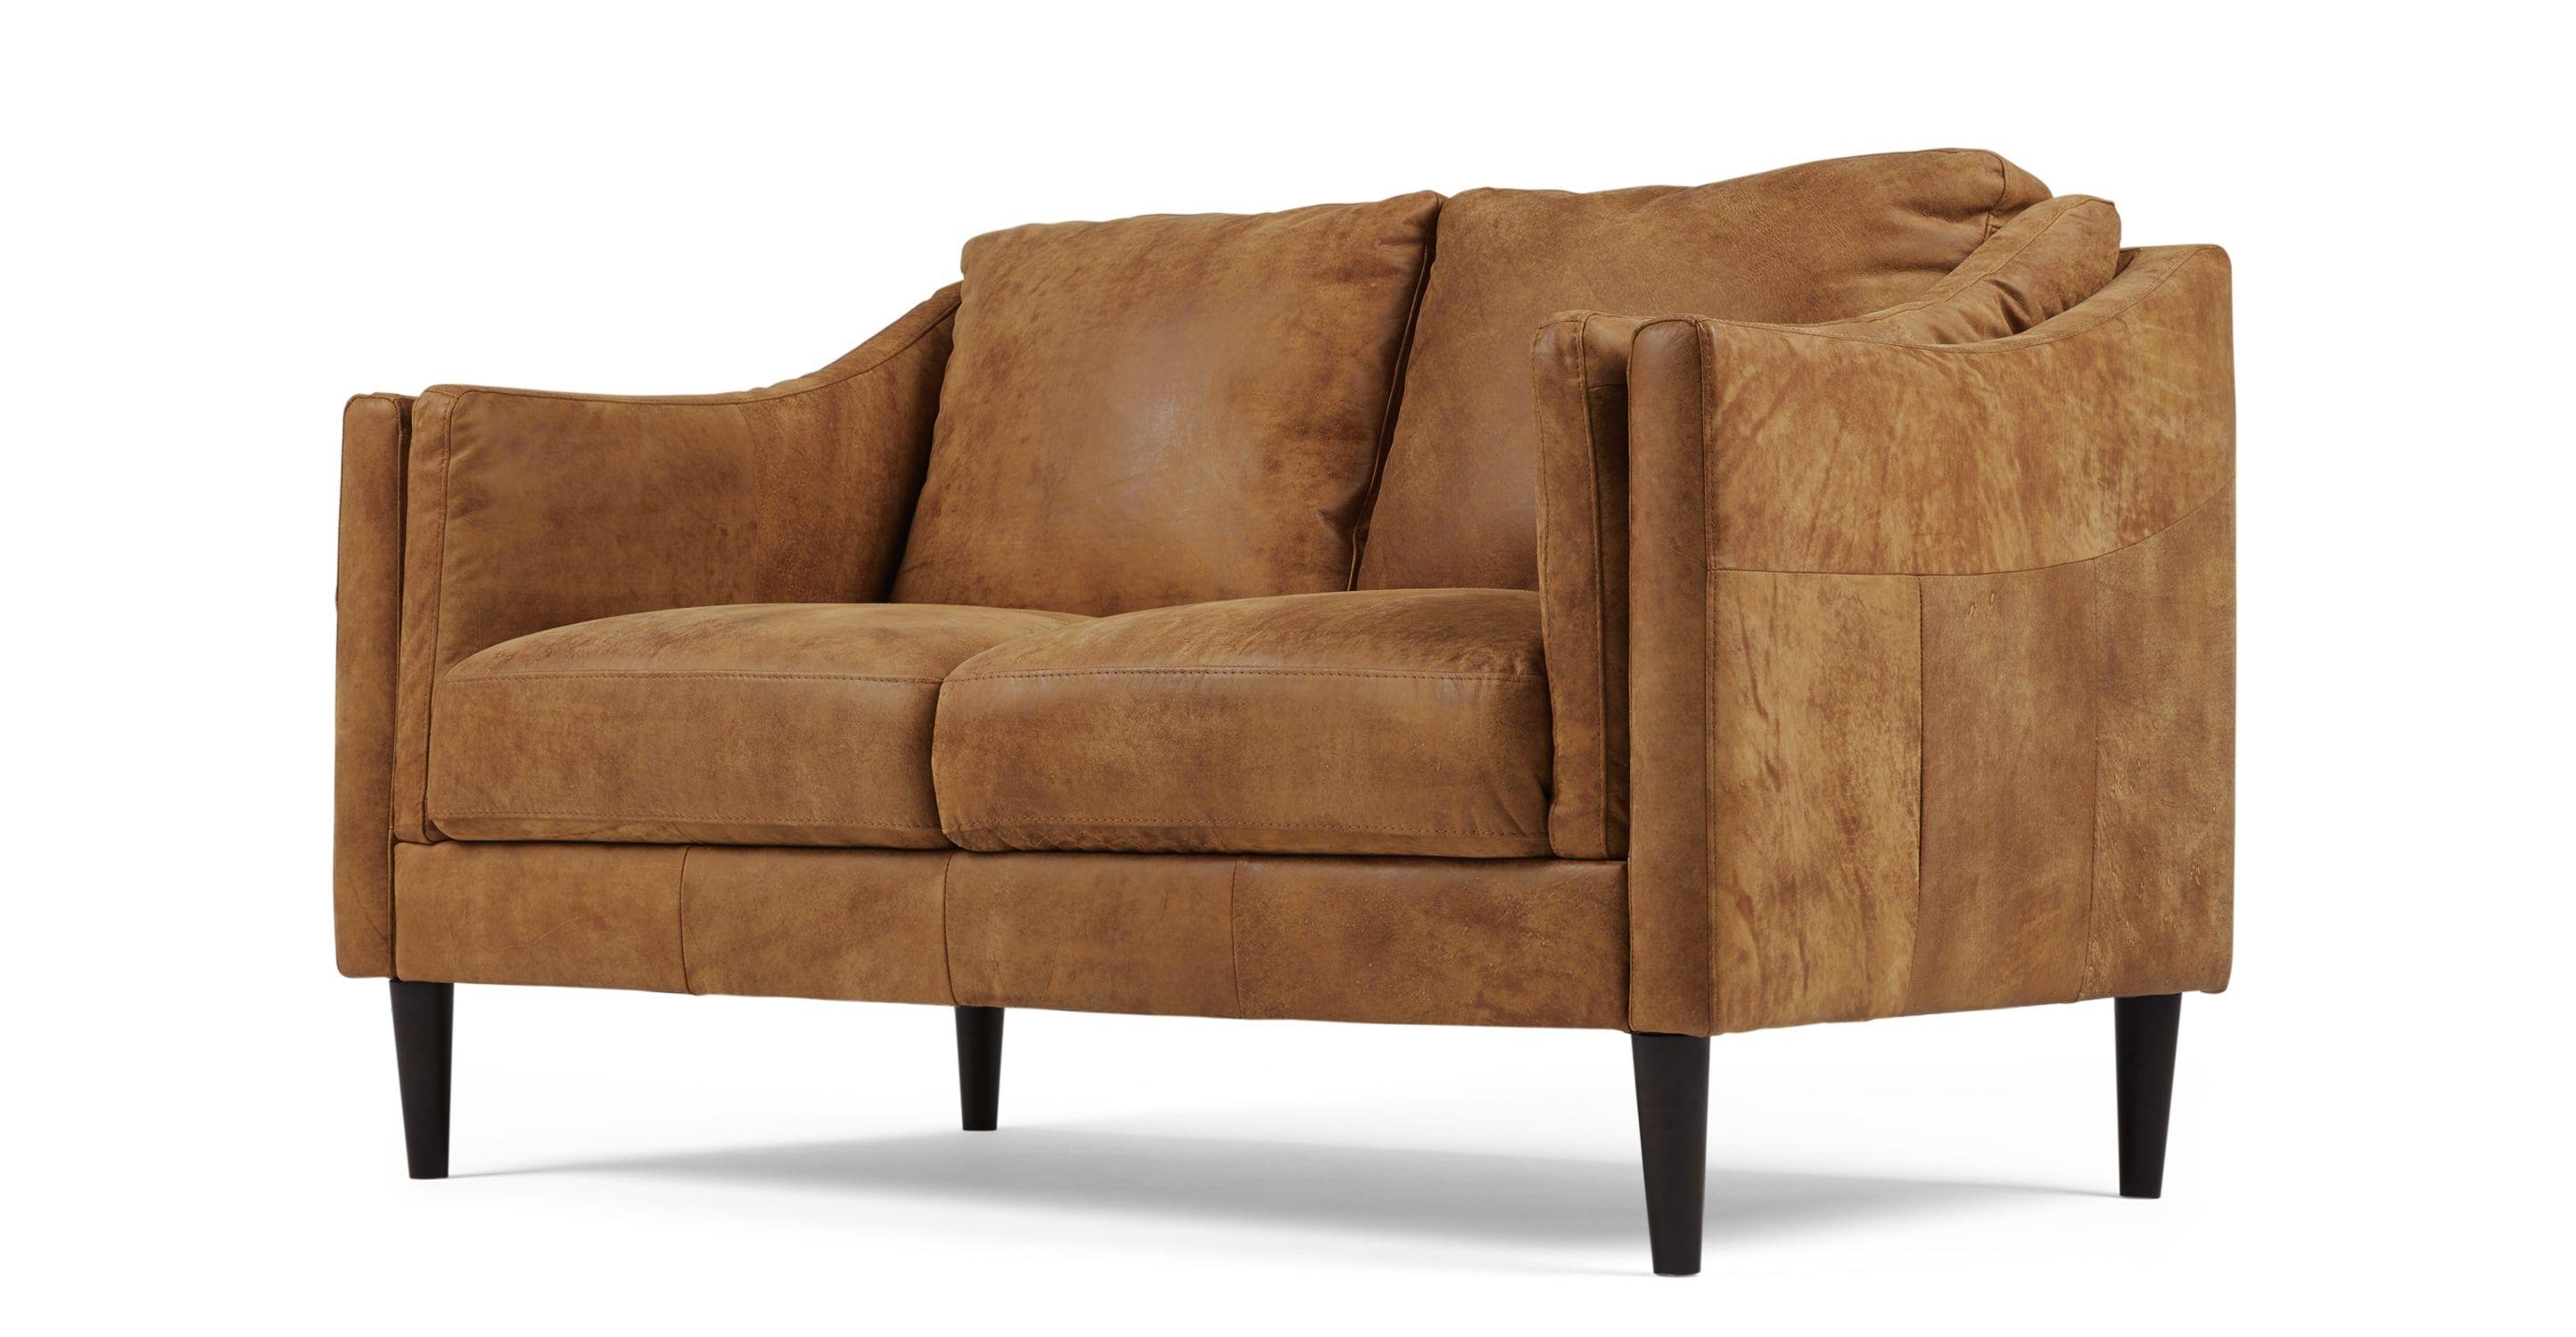 Design 2 Sitzer Sofas Ashwell 2 Sitzer Sofa Leder In Hellbraun Made Com Check Out More Made Com Canape 2 Places Cuir Brun Canape